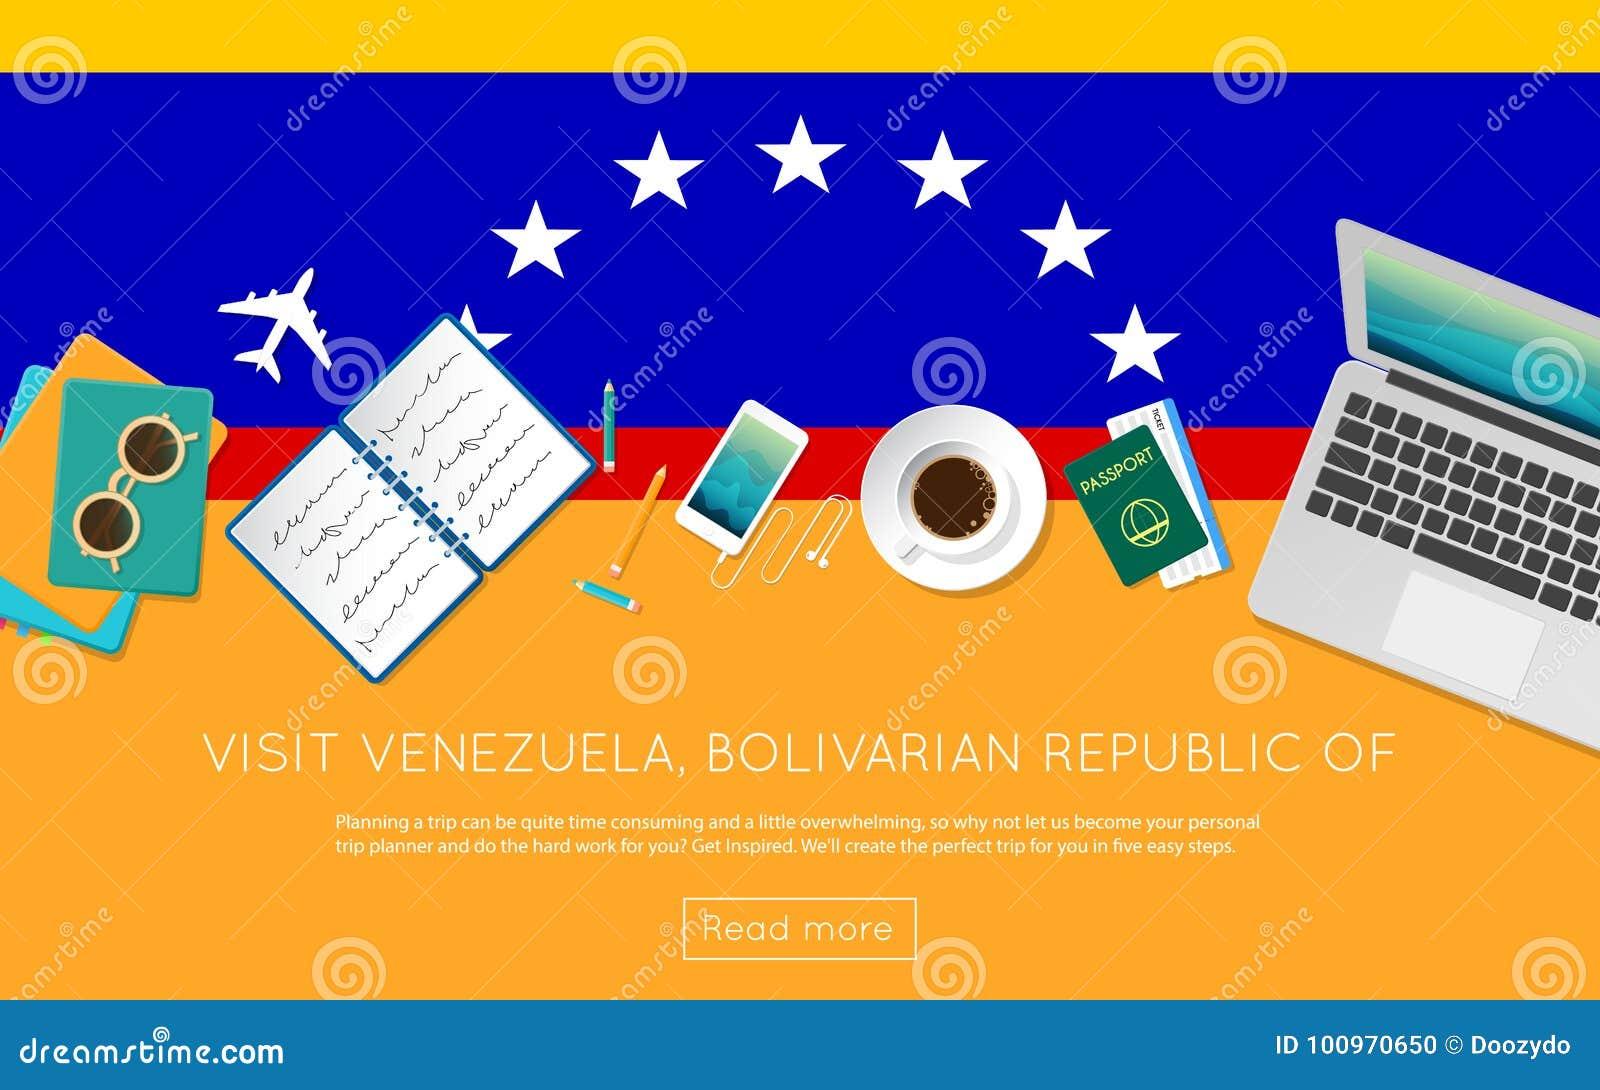 Besök Venezuela, Bolivarian republik av begreppet